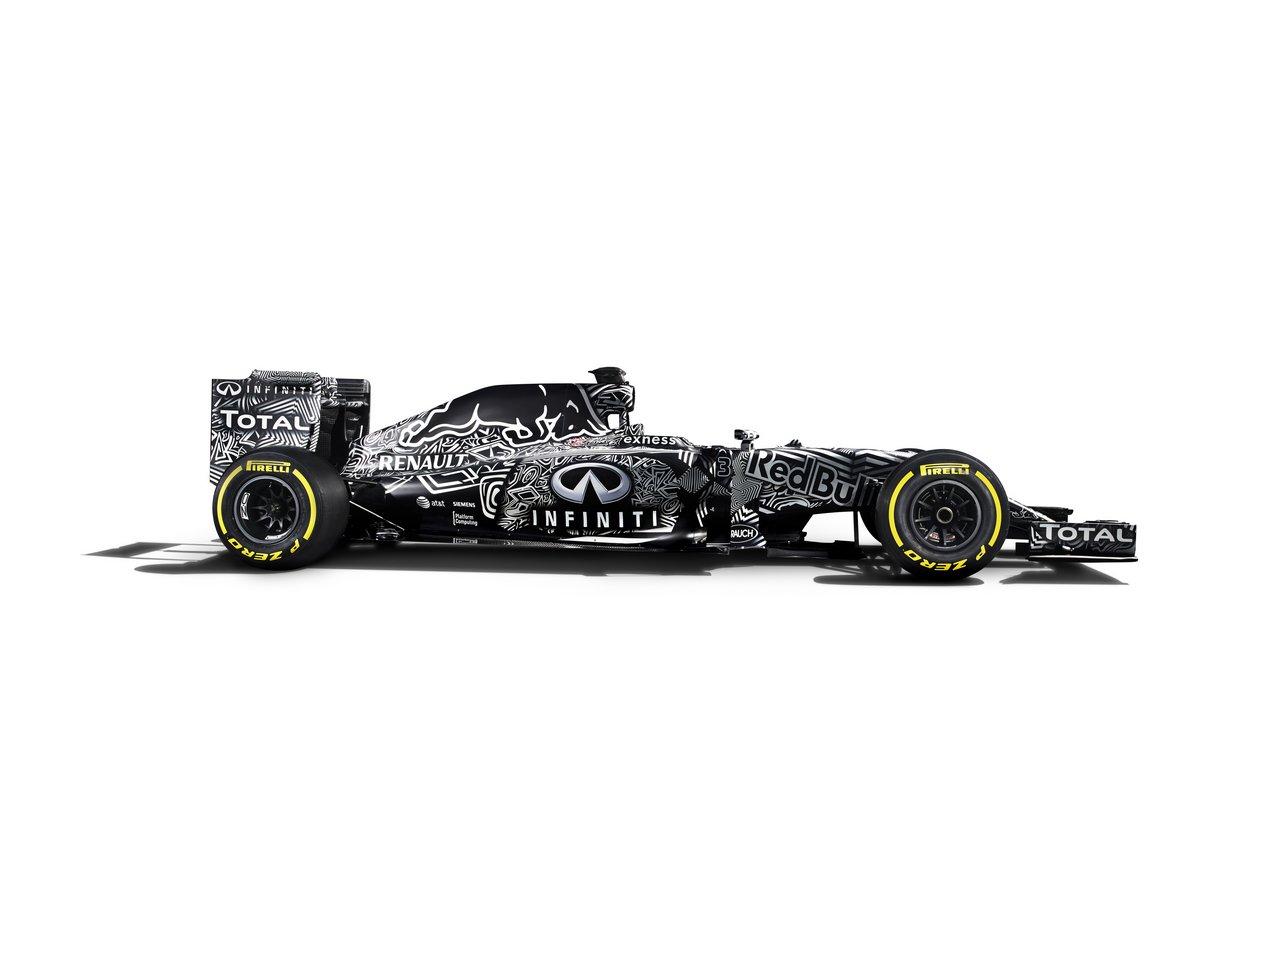 infiniti-red-bull-racing-rb-11-2015-formula-1-Daniil-Kvyat-Daniel-Ricciardo_0-100_3